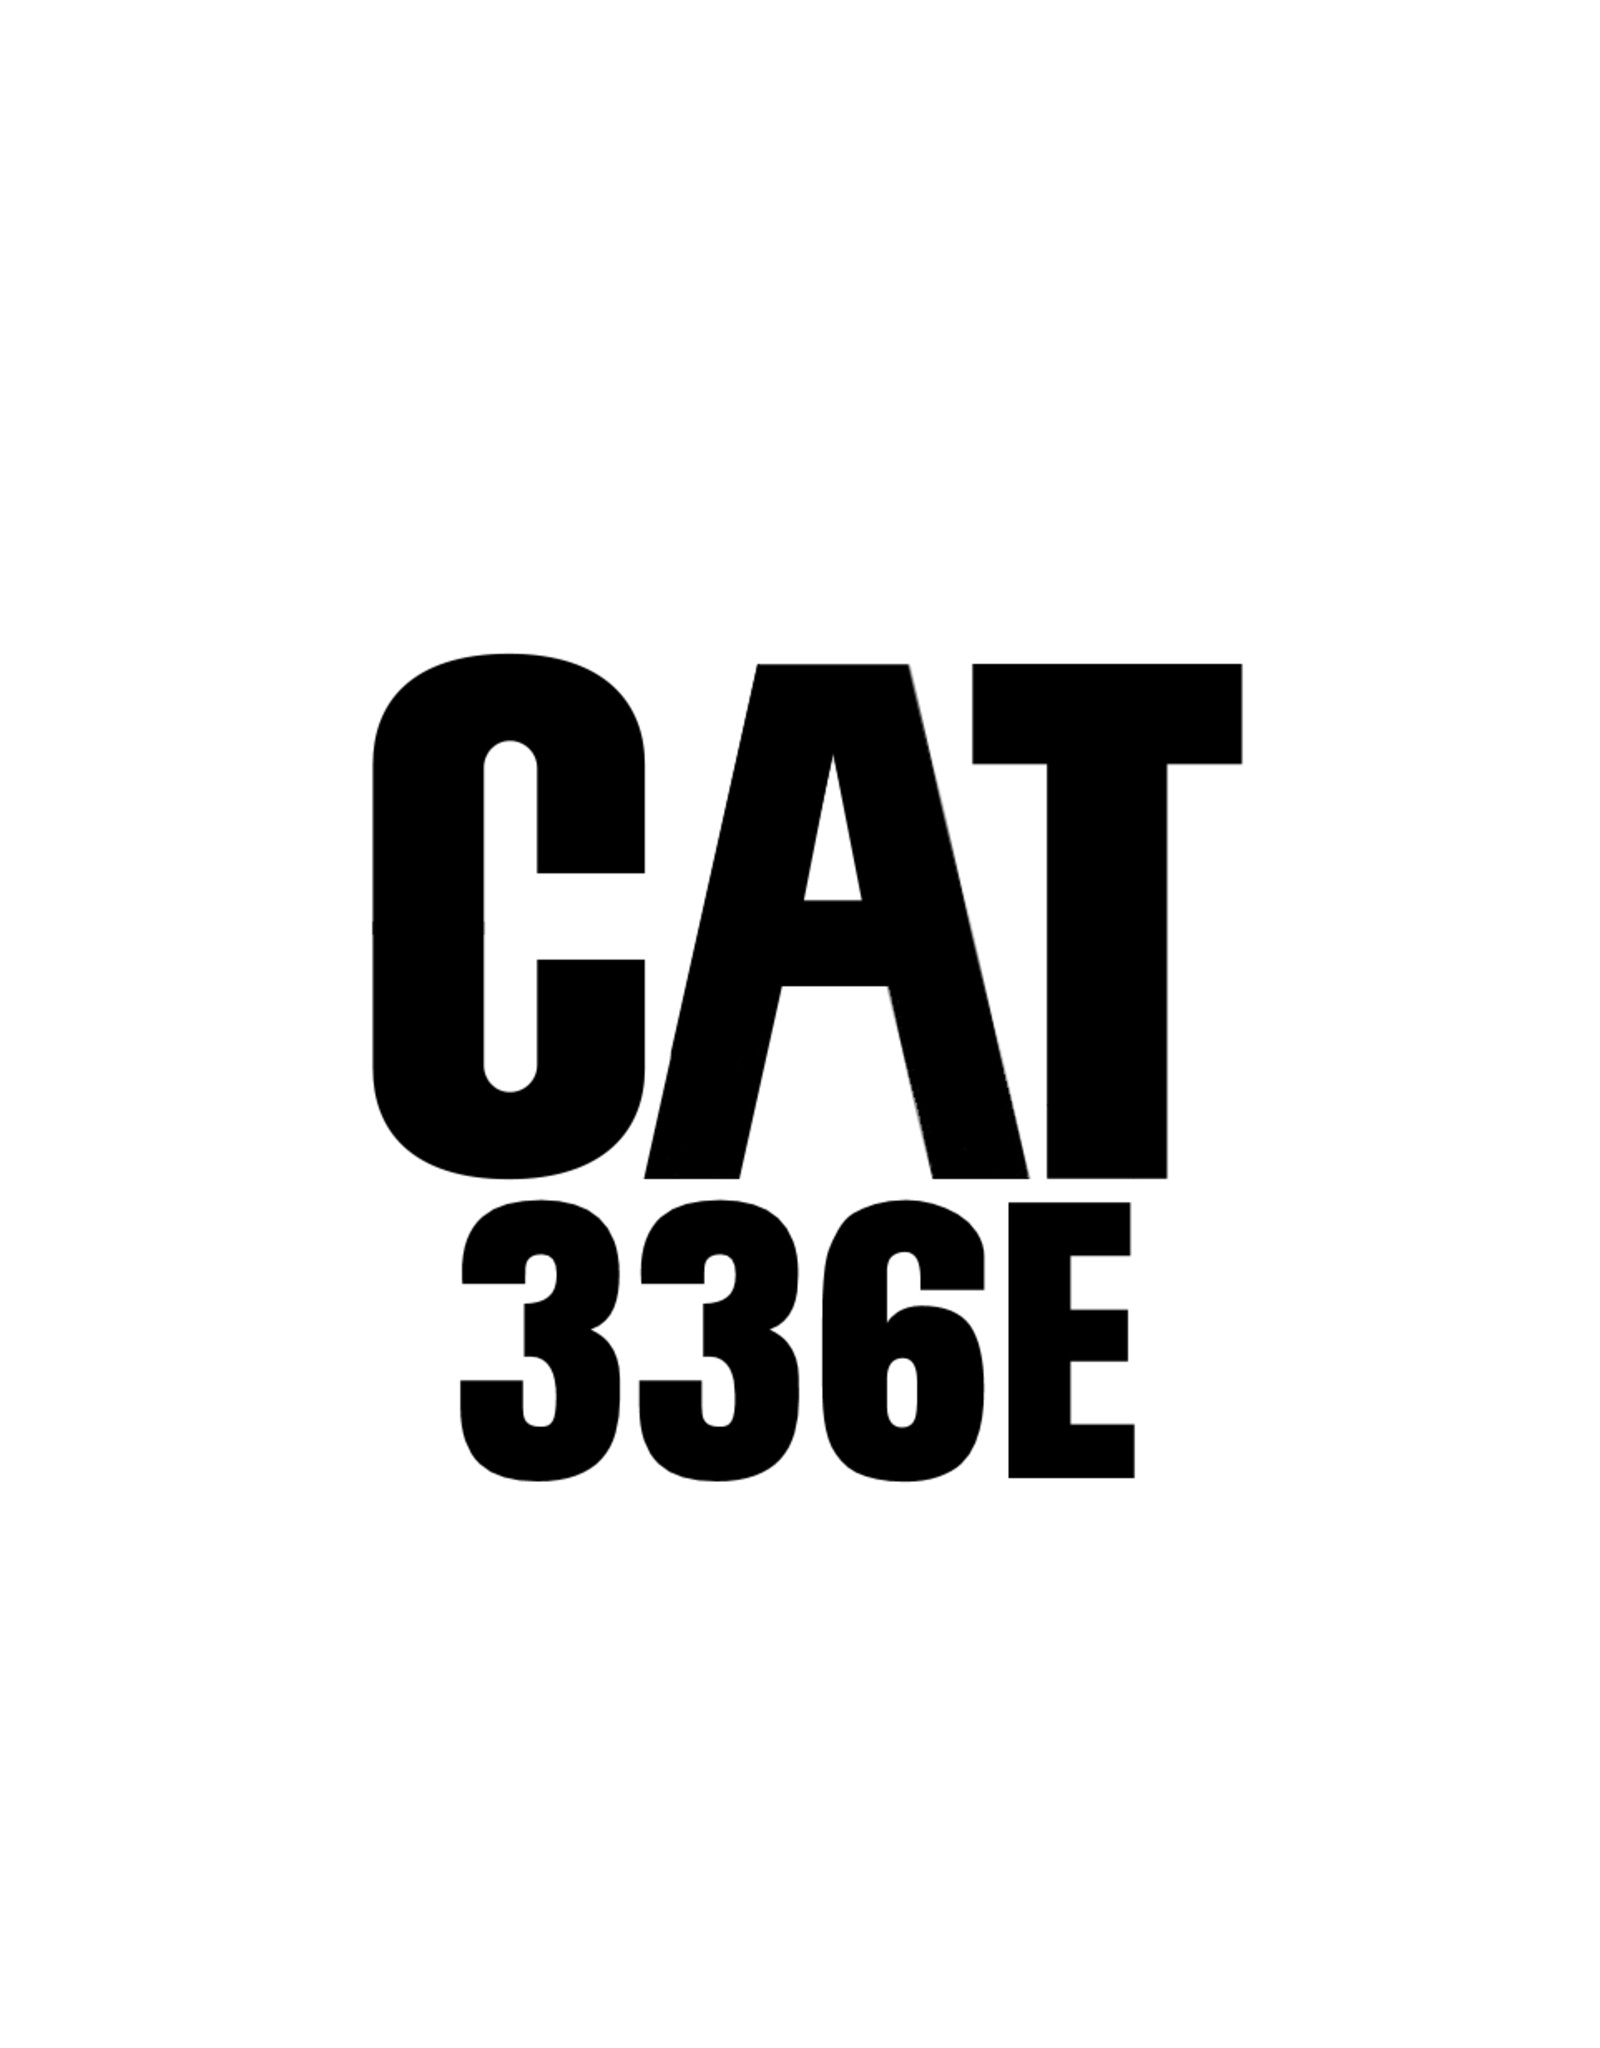 Echle Hartstahl GmbH FOPS für CAT 336E